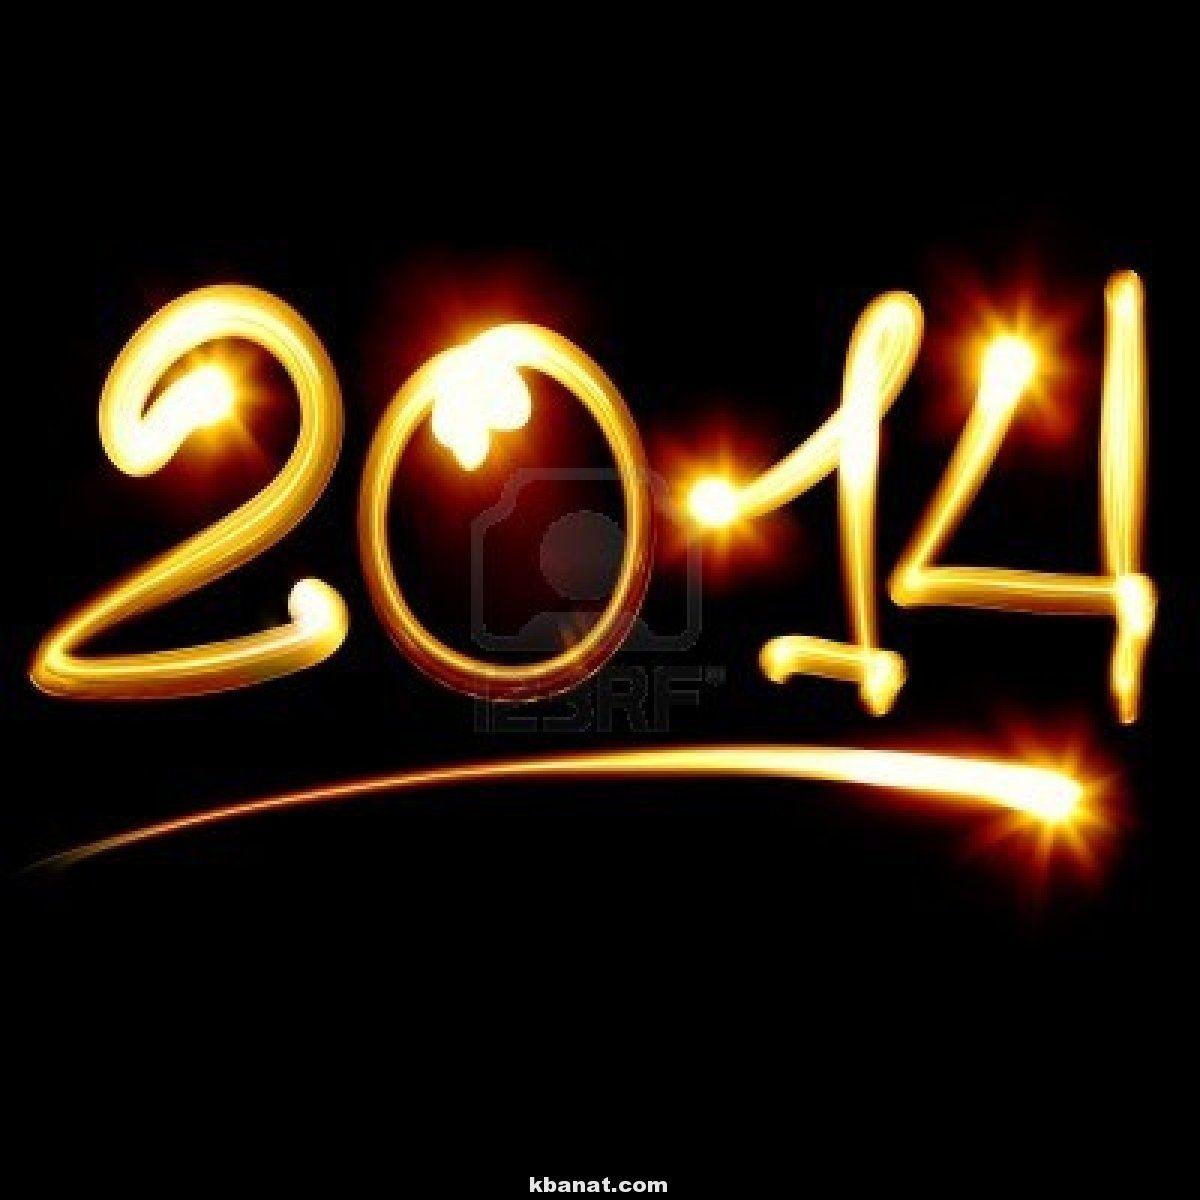 ��� ���� ��� ����� 2016 - ��� 2016 - happy new year 2017 2013_1373809956_515.